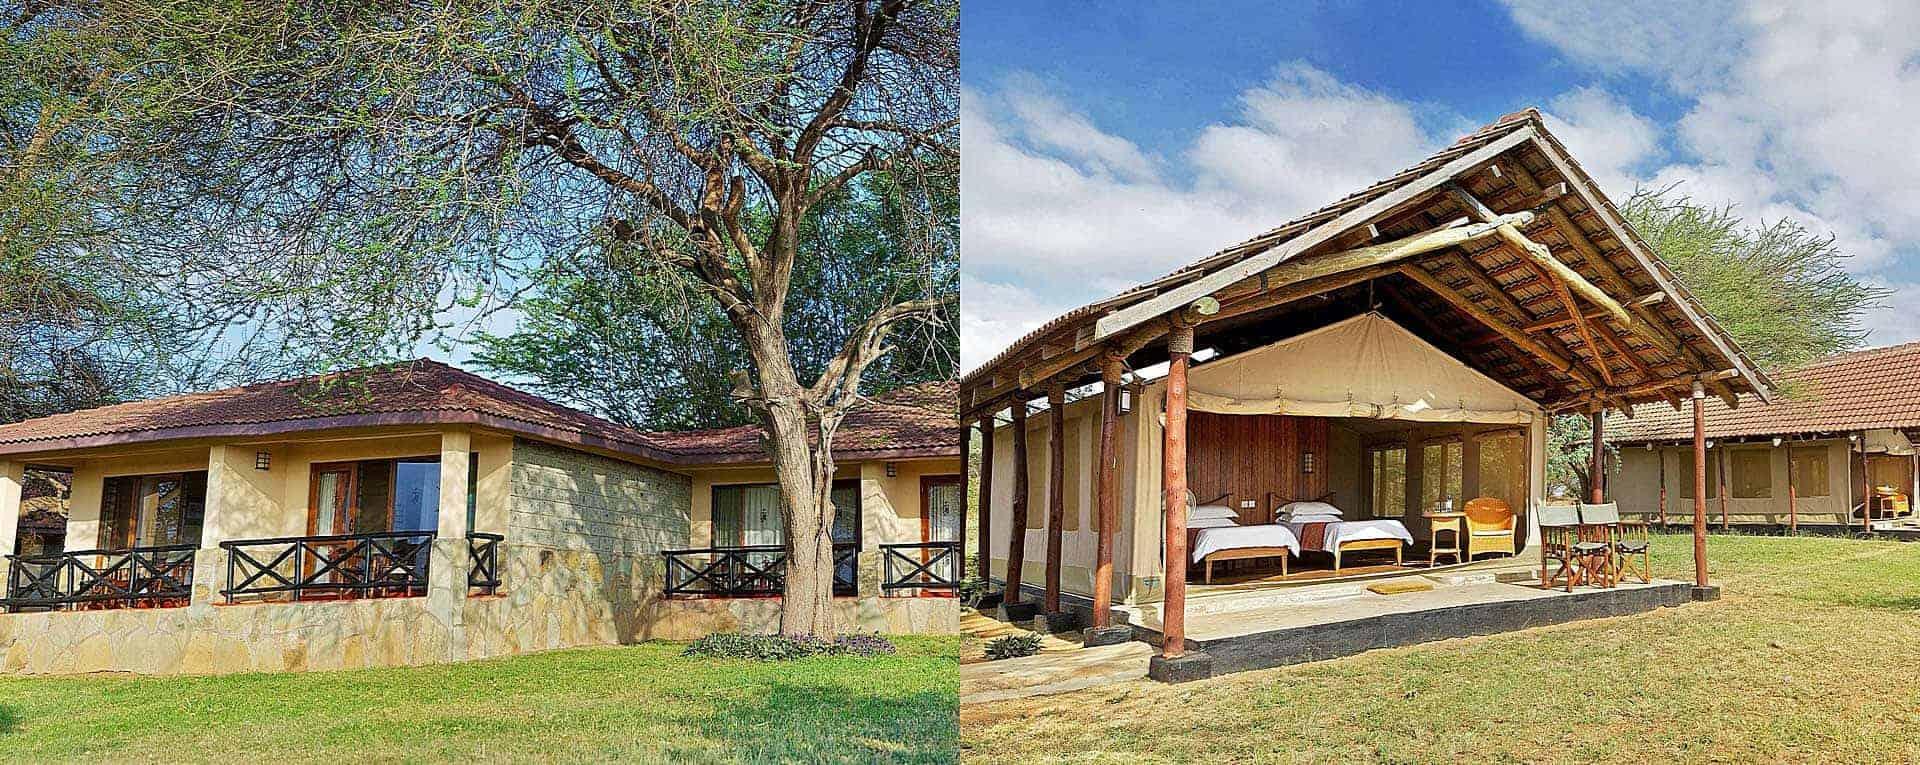 Ashnil Aruba Lodge, Tsavo East - Kenya - AfricanMecca Safaris & Tours